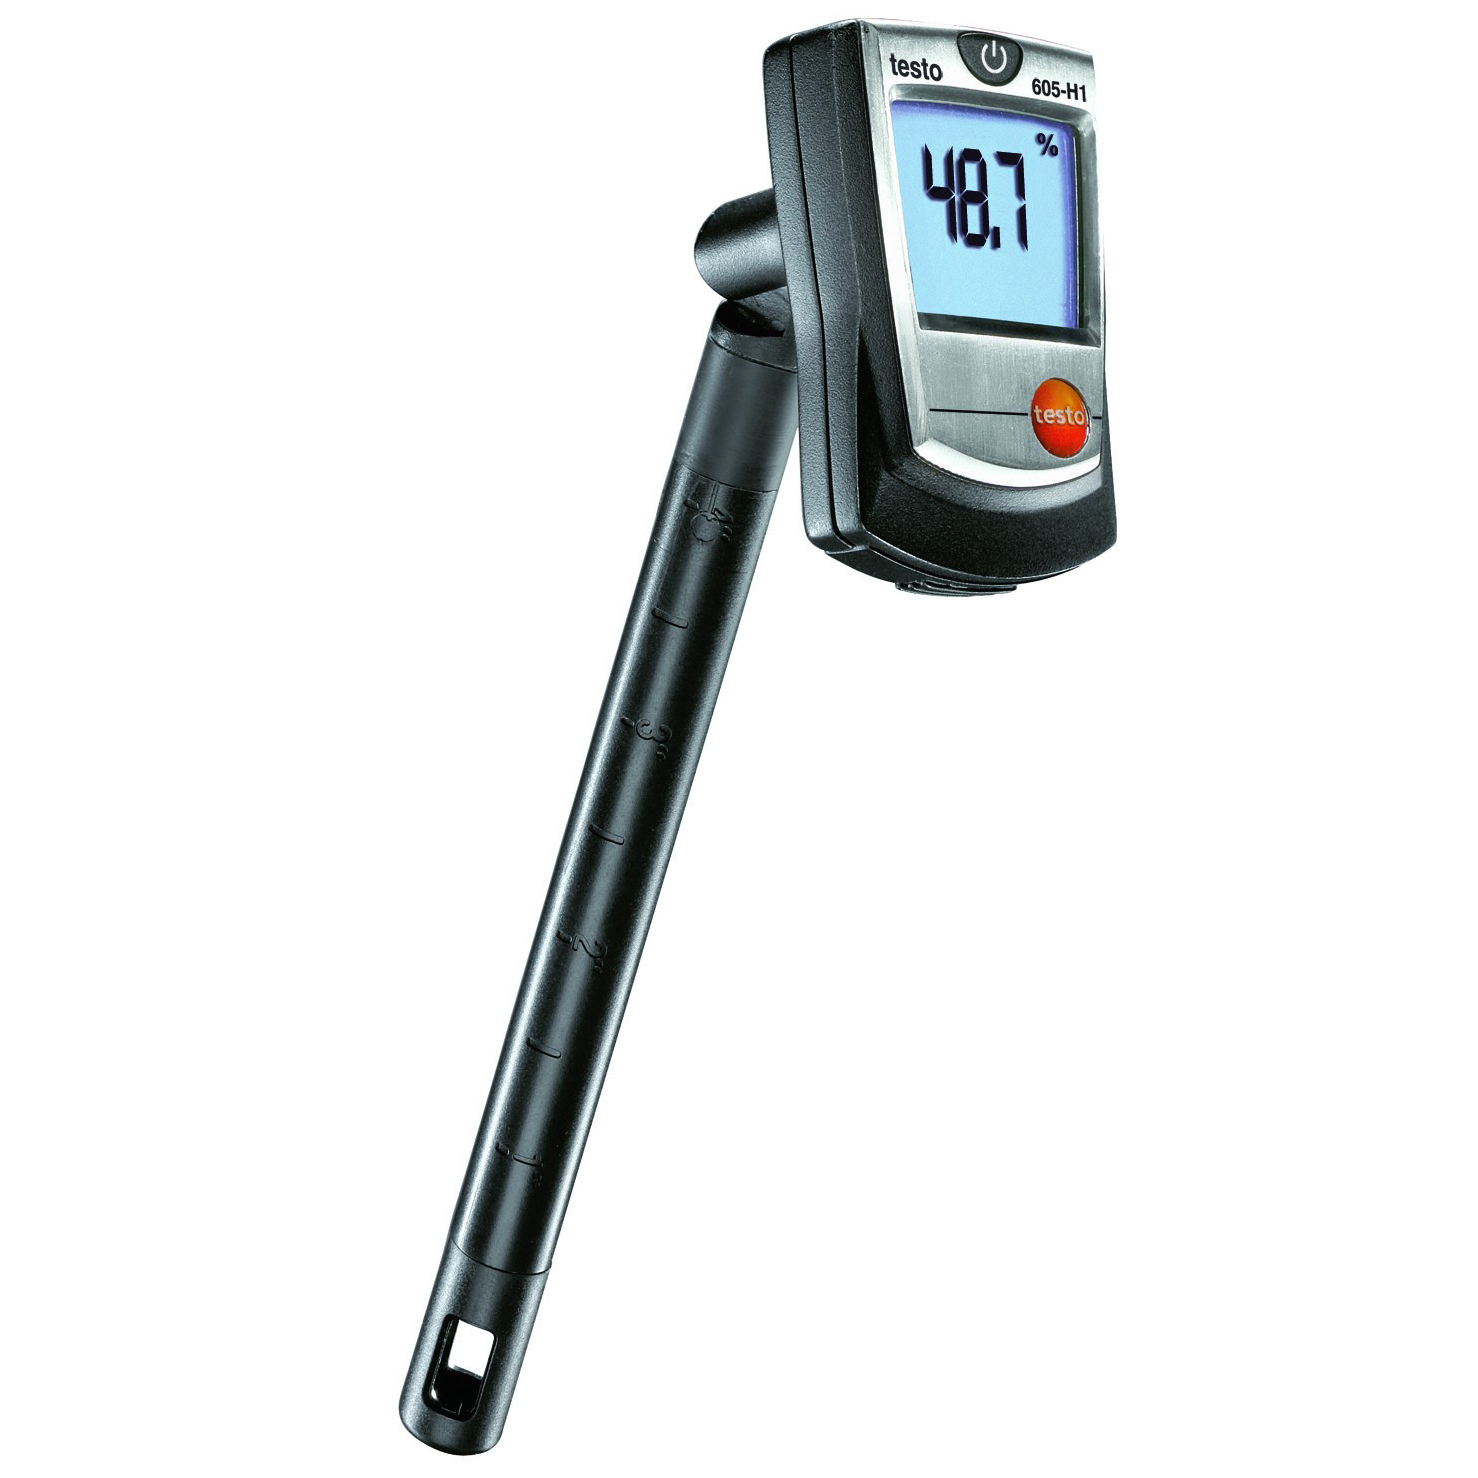 Гигрометр Testo 605-Н1.